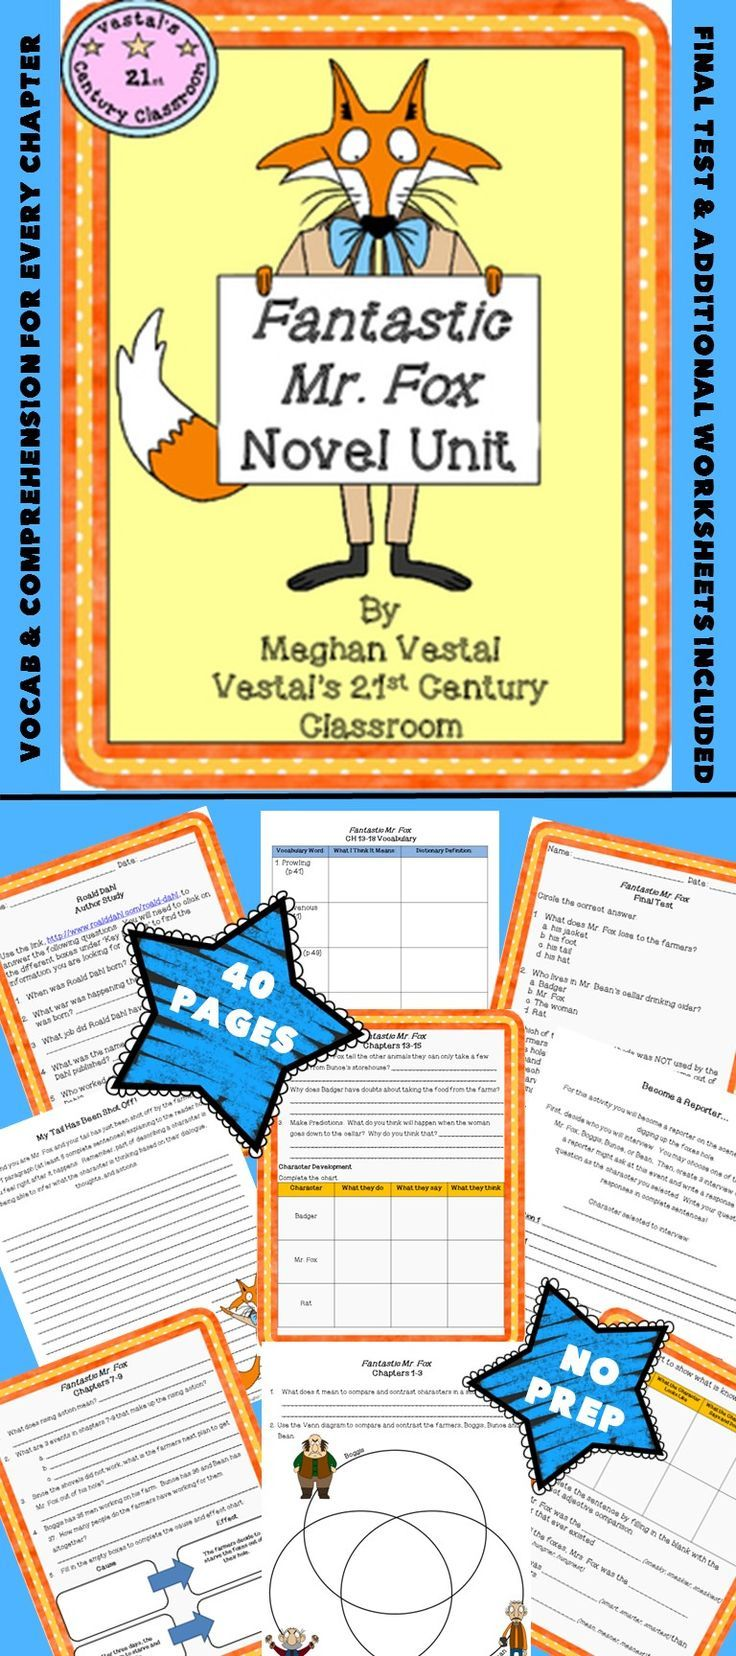 Fantastic Mr. Fox 5 Vestal's 21st Century Classroom